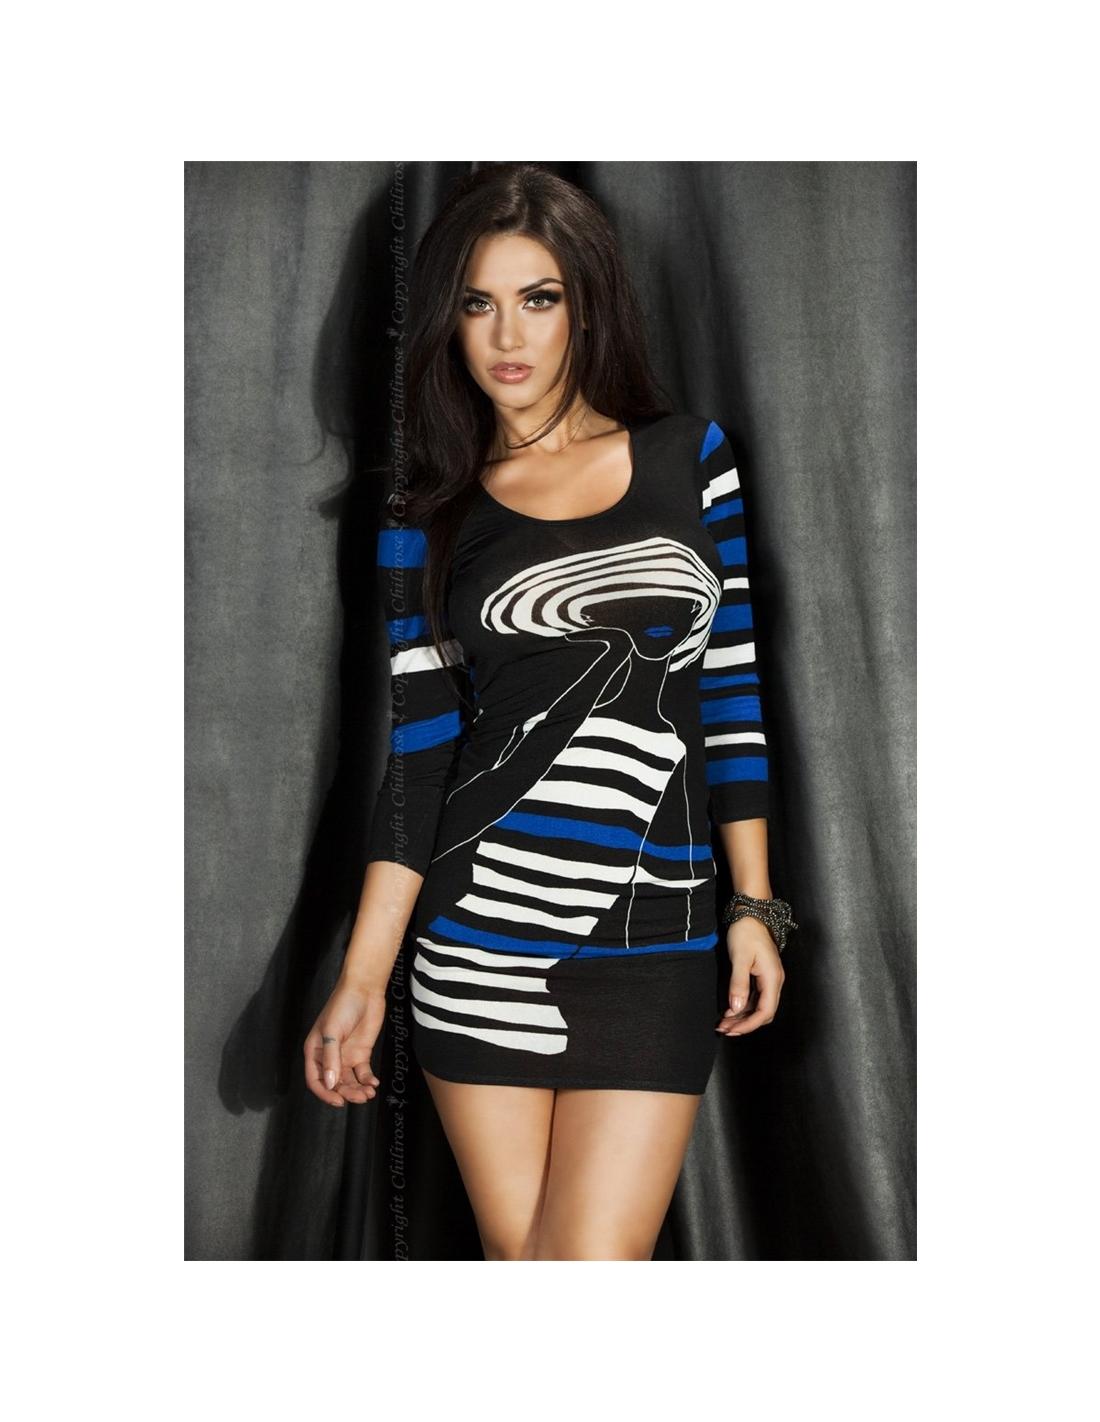 Vestido Cr-3535 Azul - 36-38 S/M - PR2010320312